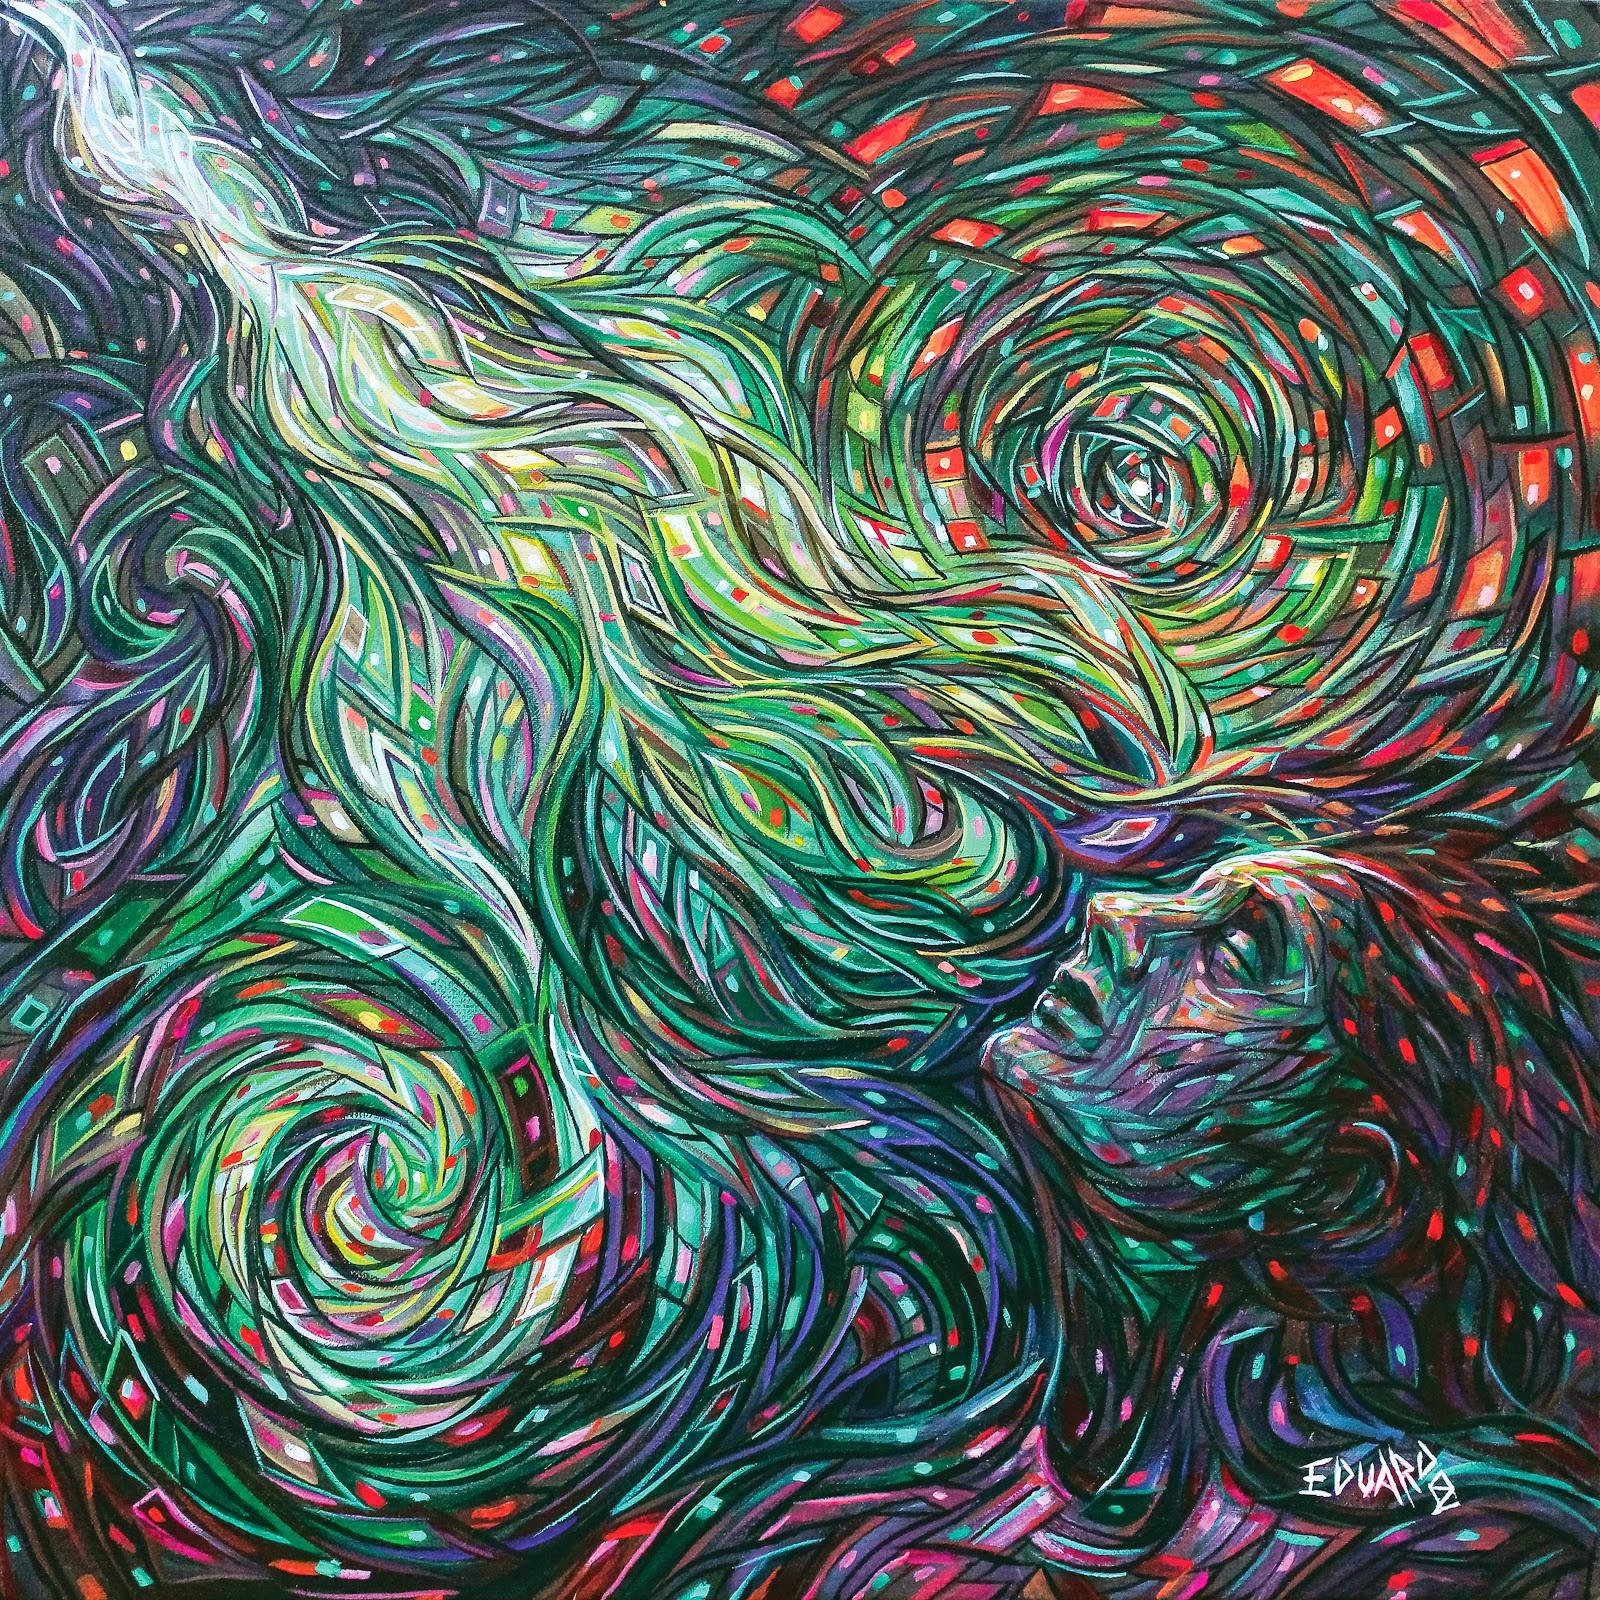 13-Mental-Image-Eduardo-R-Calzado-Paintings-in-Swirls-of-Colour-www-designstack-co